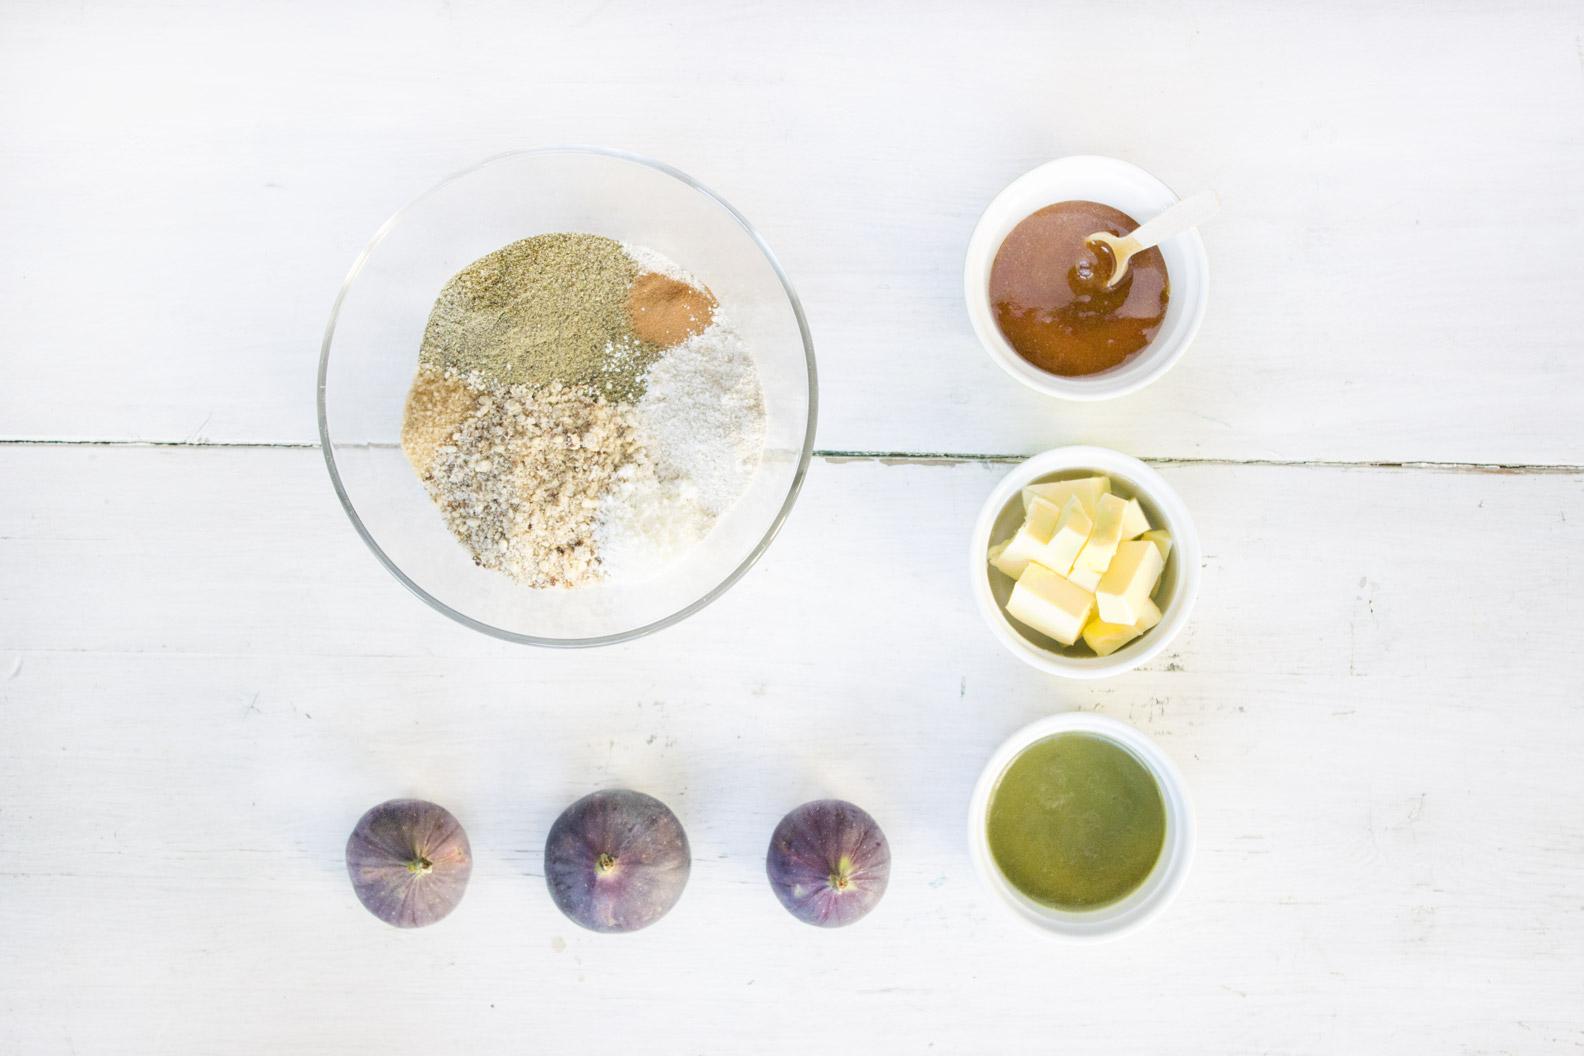 Ciastka konopne - składniki